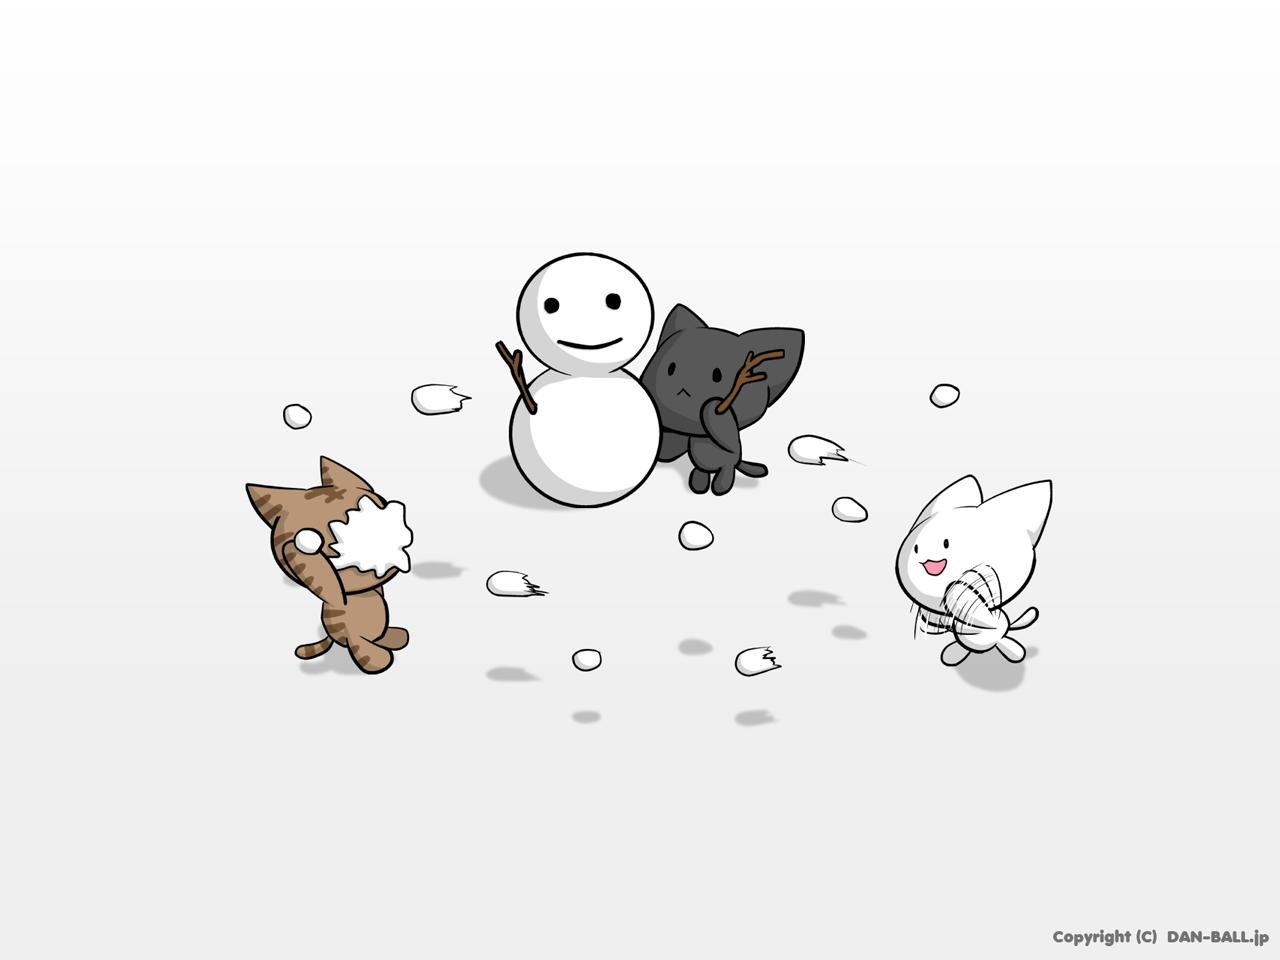 Uncategorized Snowball Fight Gif image kitten snowball fight png austin ally wiki fandom png